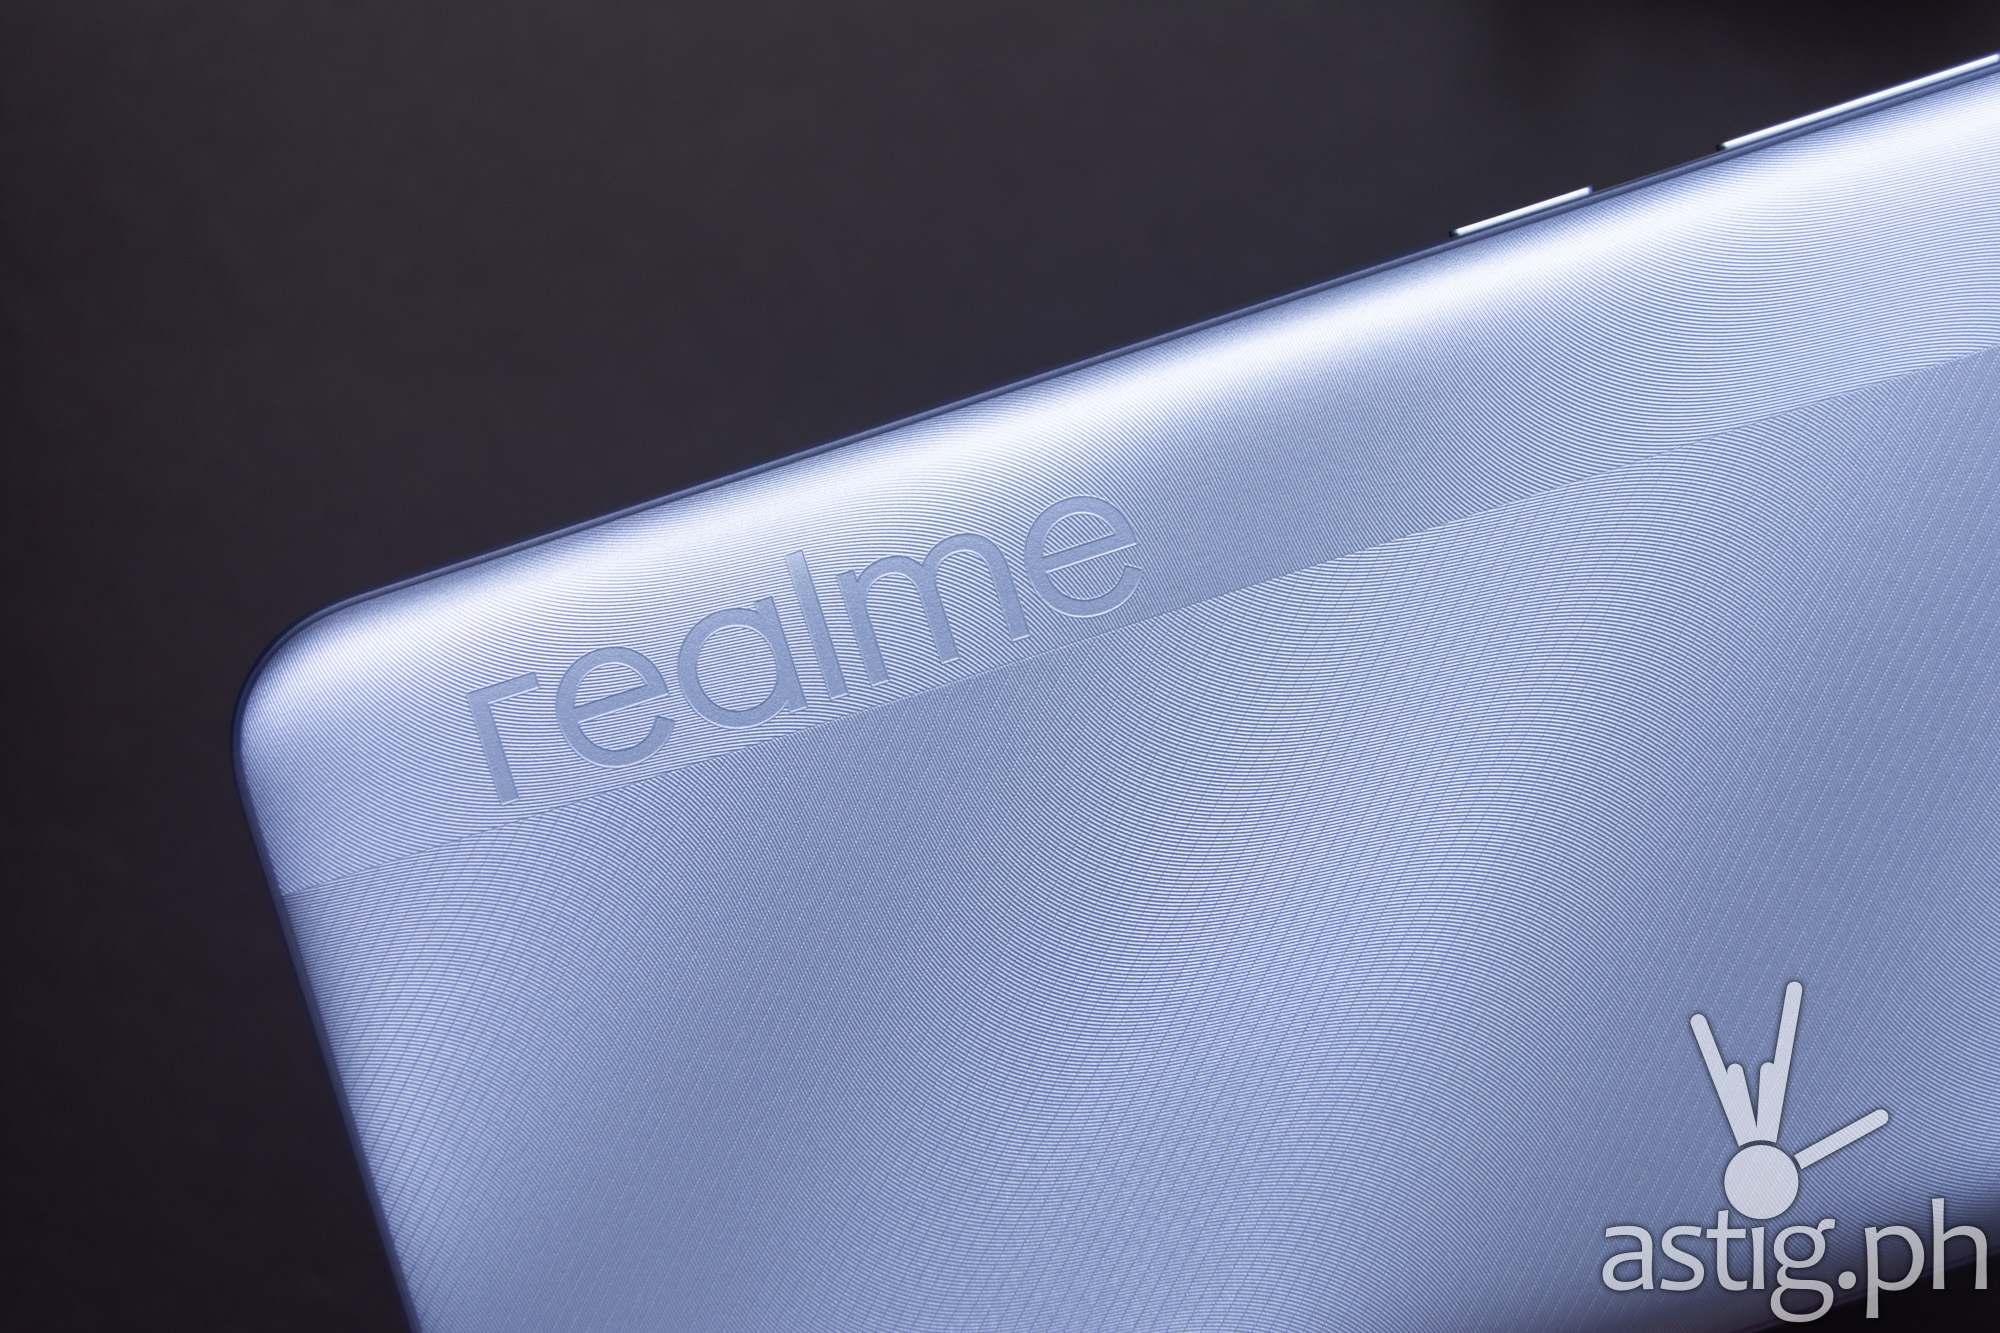 Back showing realme logo - realme c25 (Philippines)